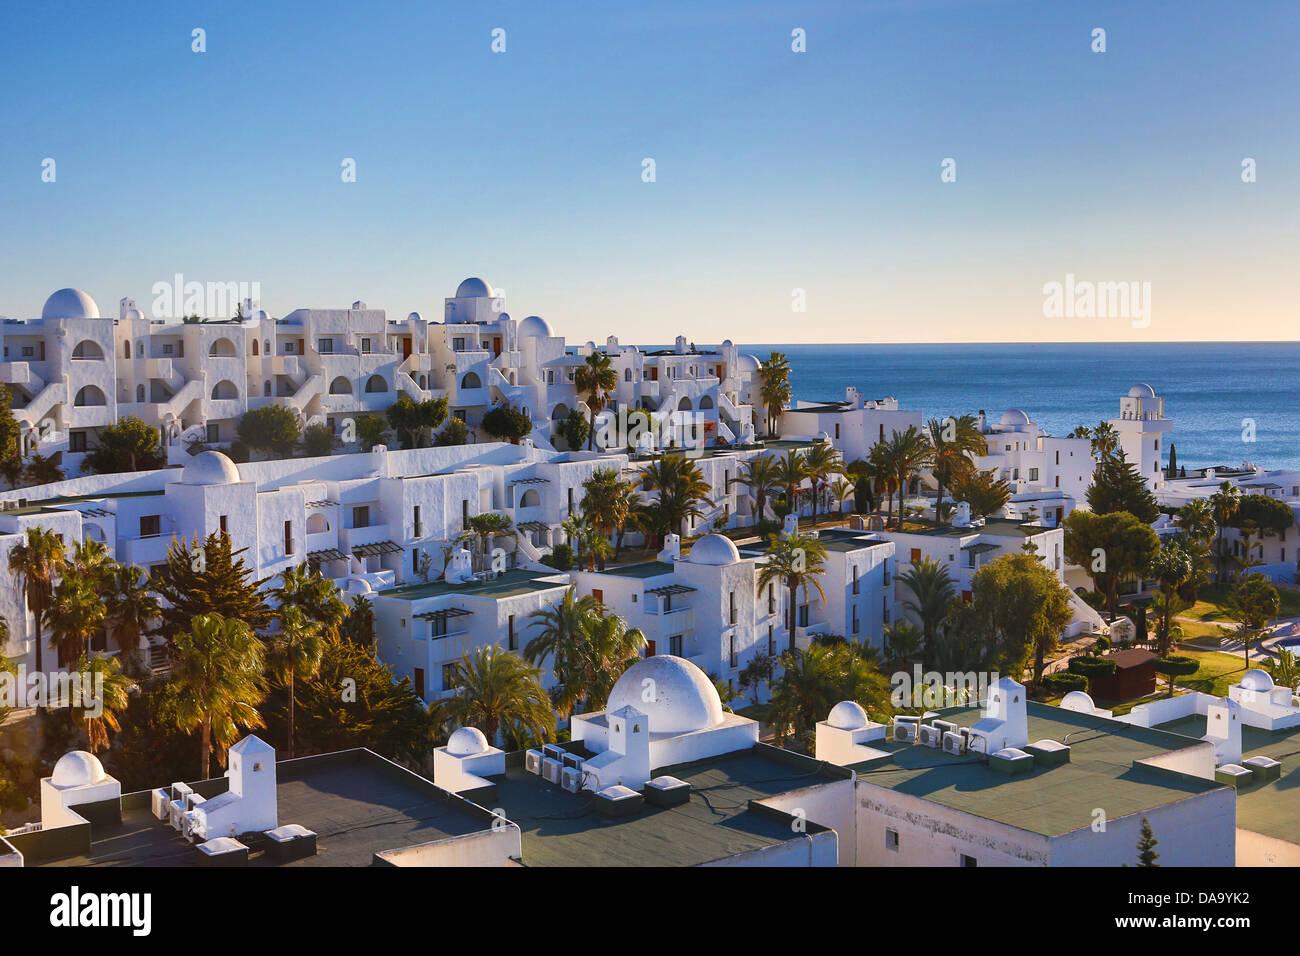 España, Europa, Andalucía, playa, costa, edificios, Mediterráneo, nuevo, palm mar, turísticos, Imagen De Stock